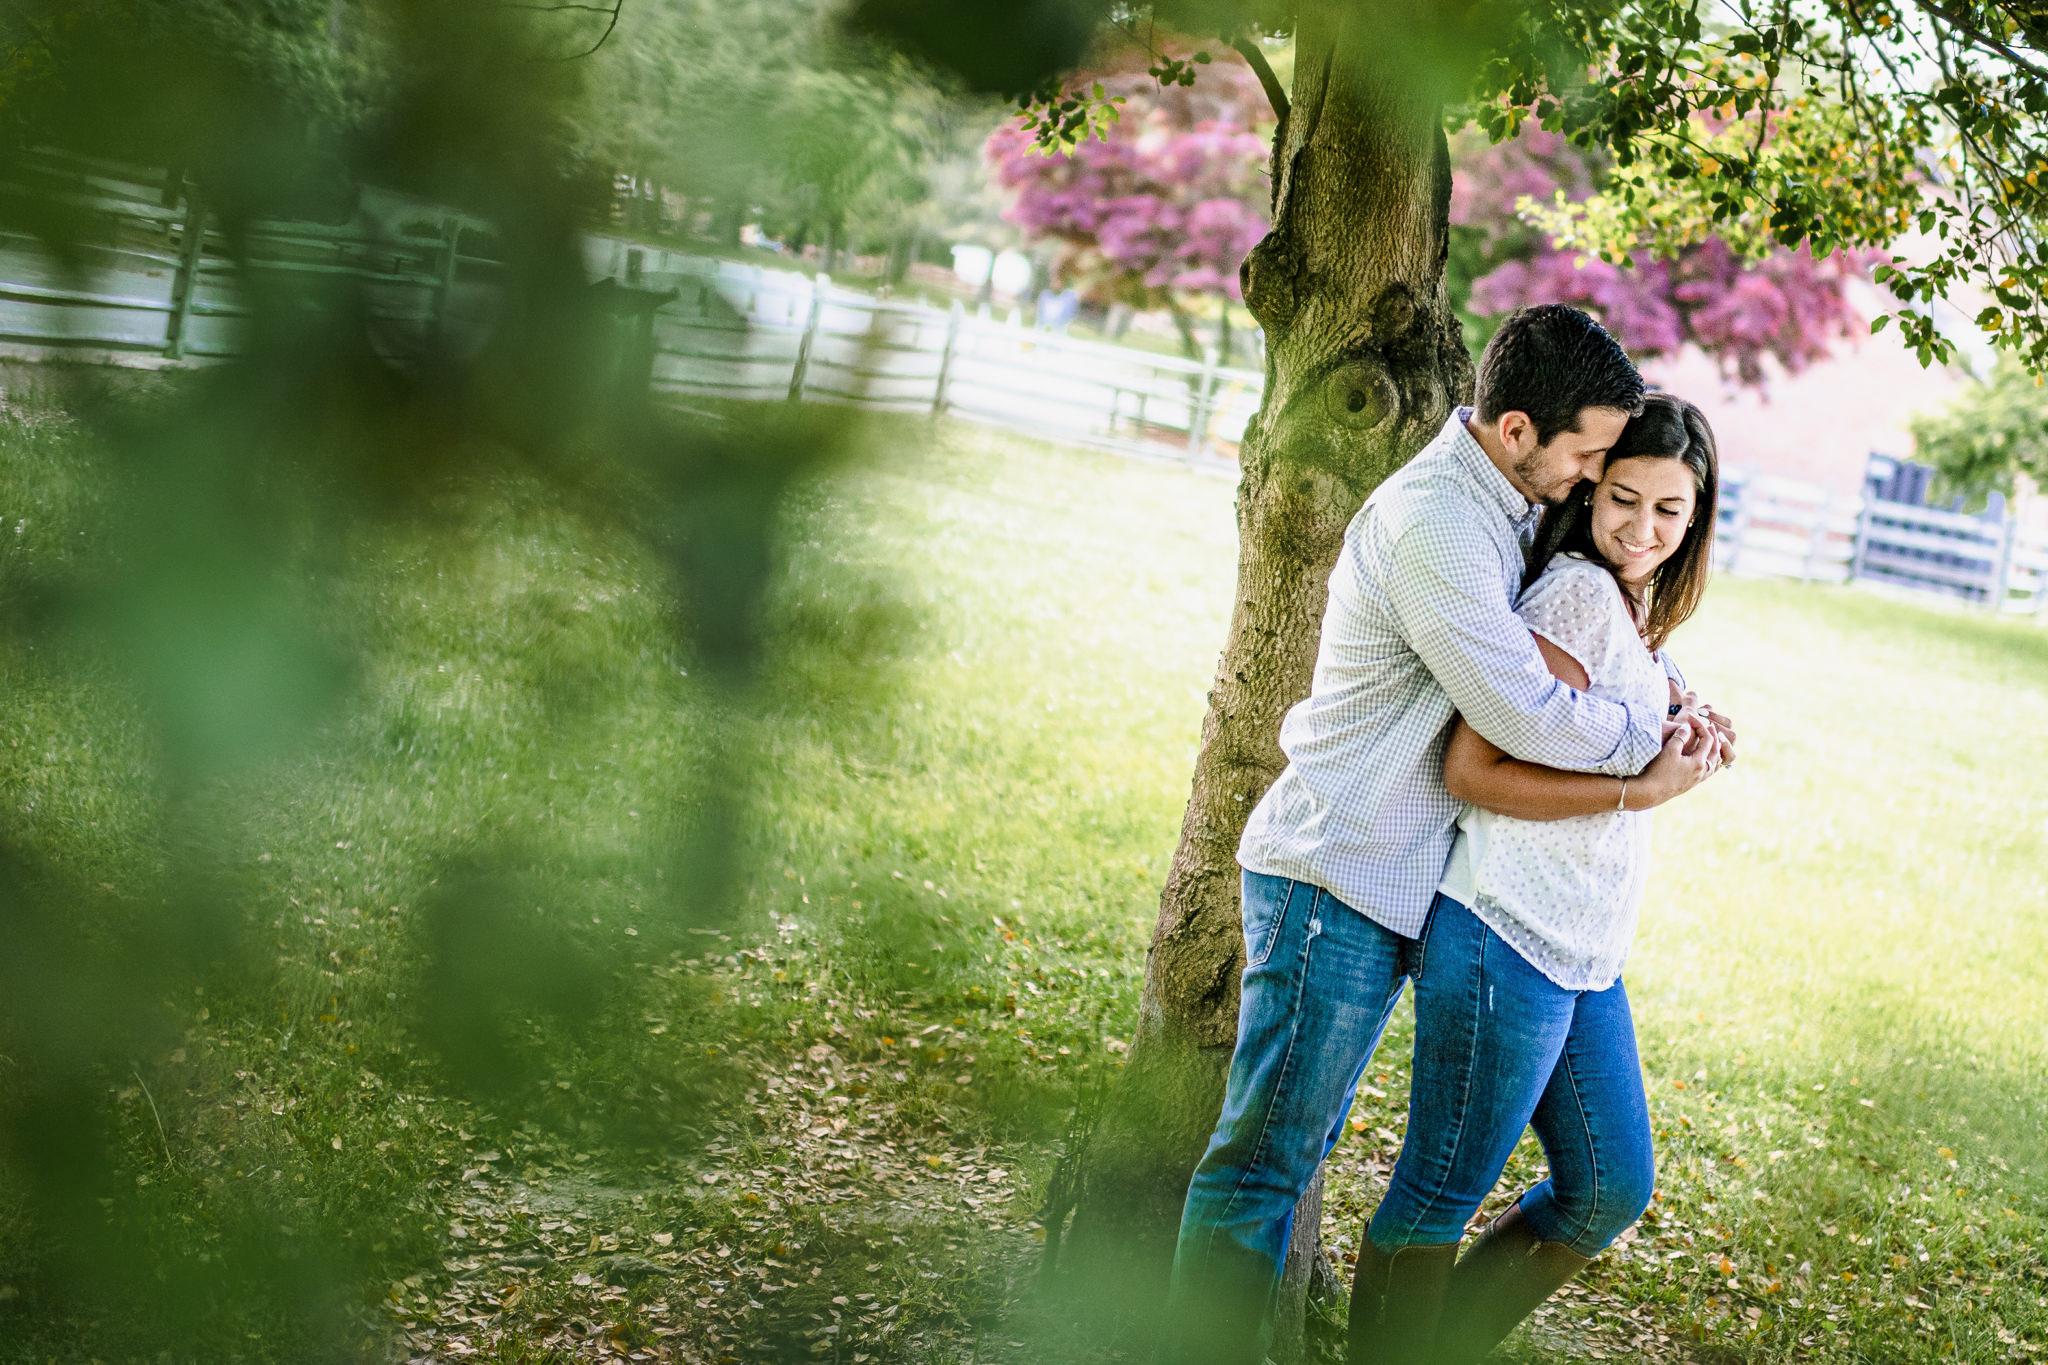 Gilbert-Allaire-State-Park-NJ-Engagement-Photos-12.JPG